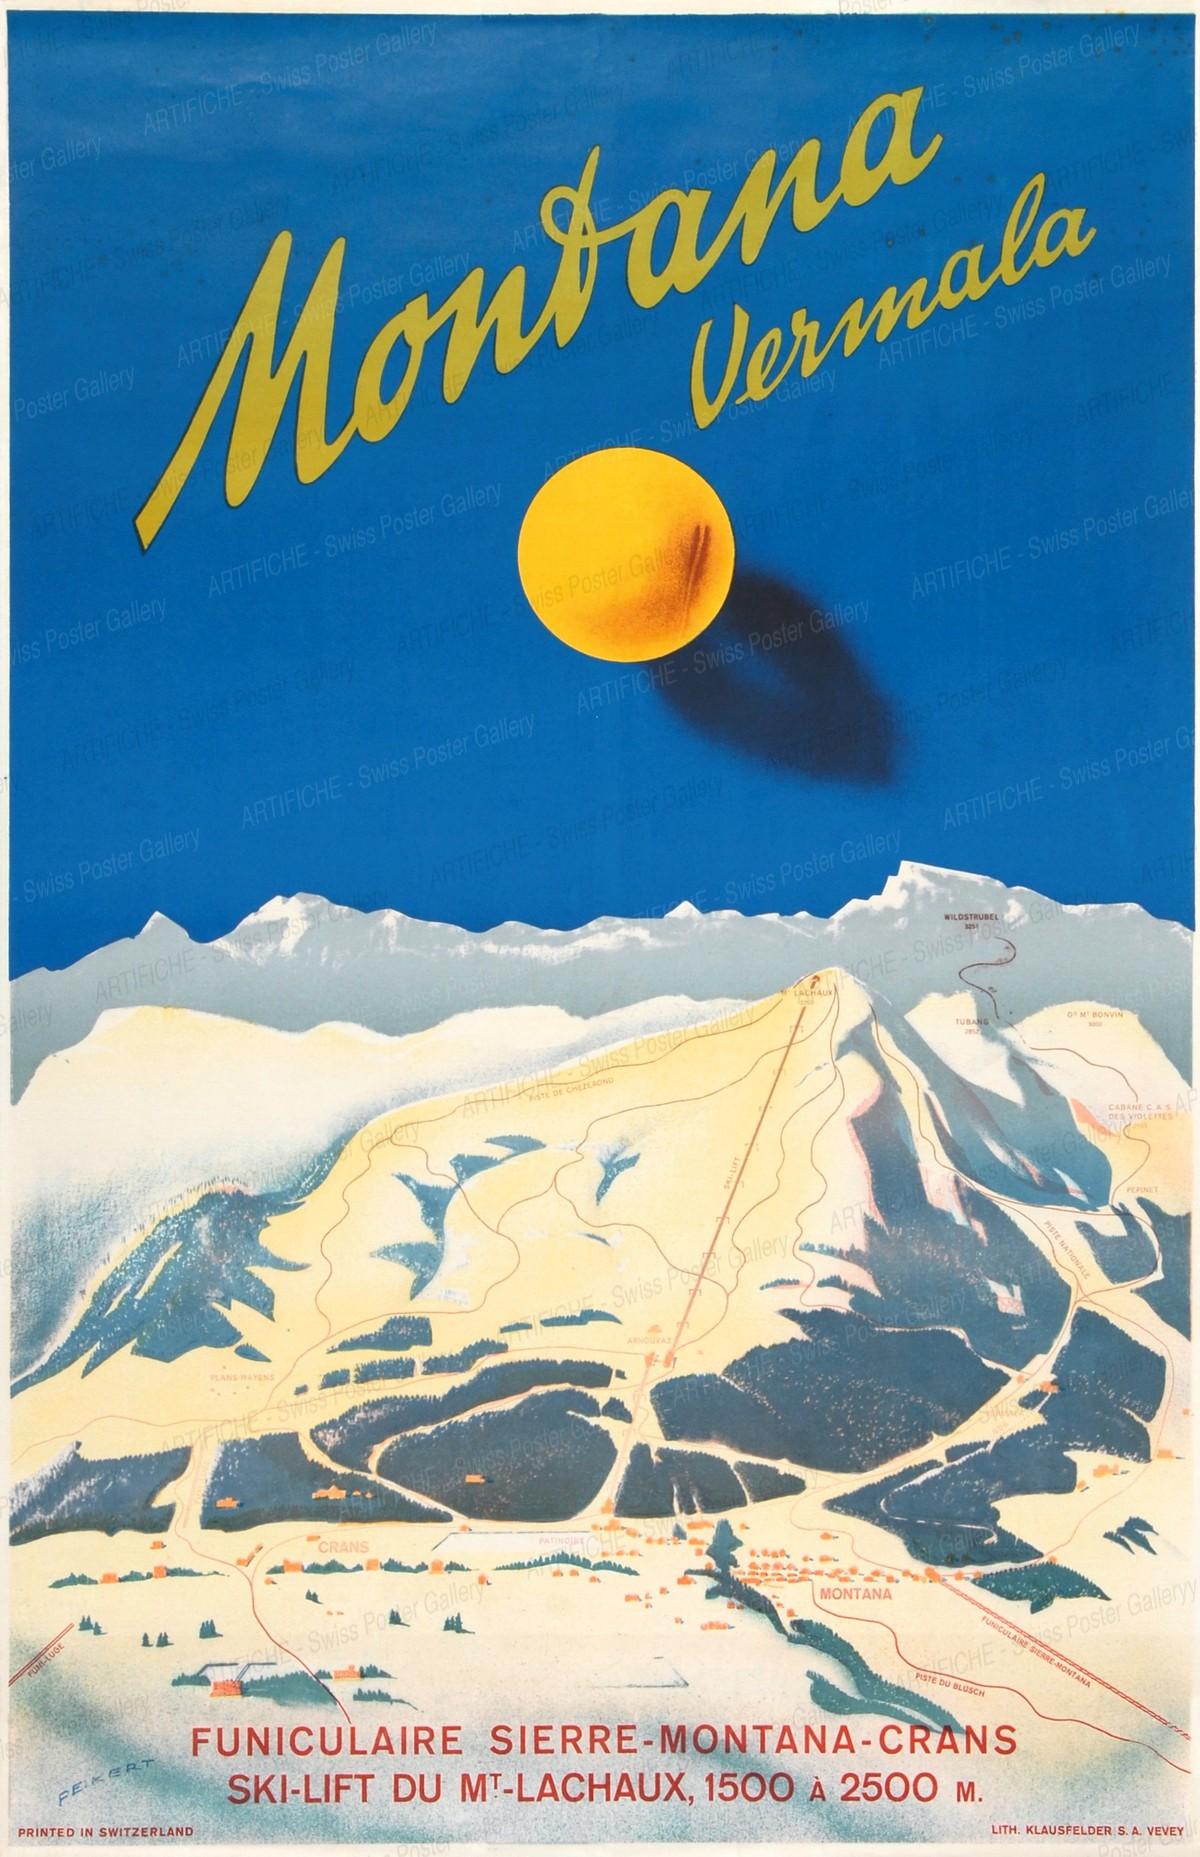 Montana Vermala – Sierre-Montana-Crans Funicular, Martin Peikert